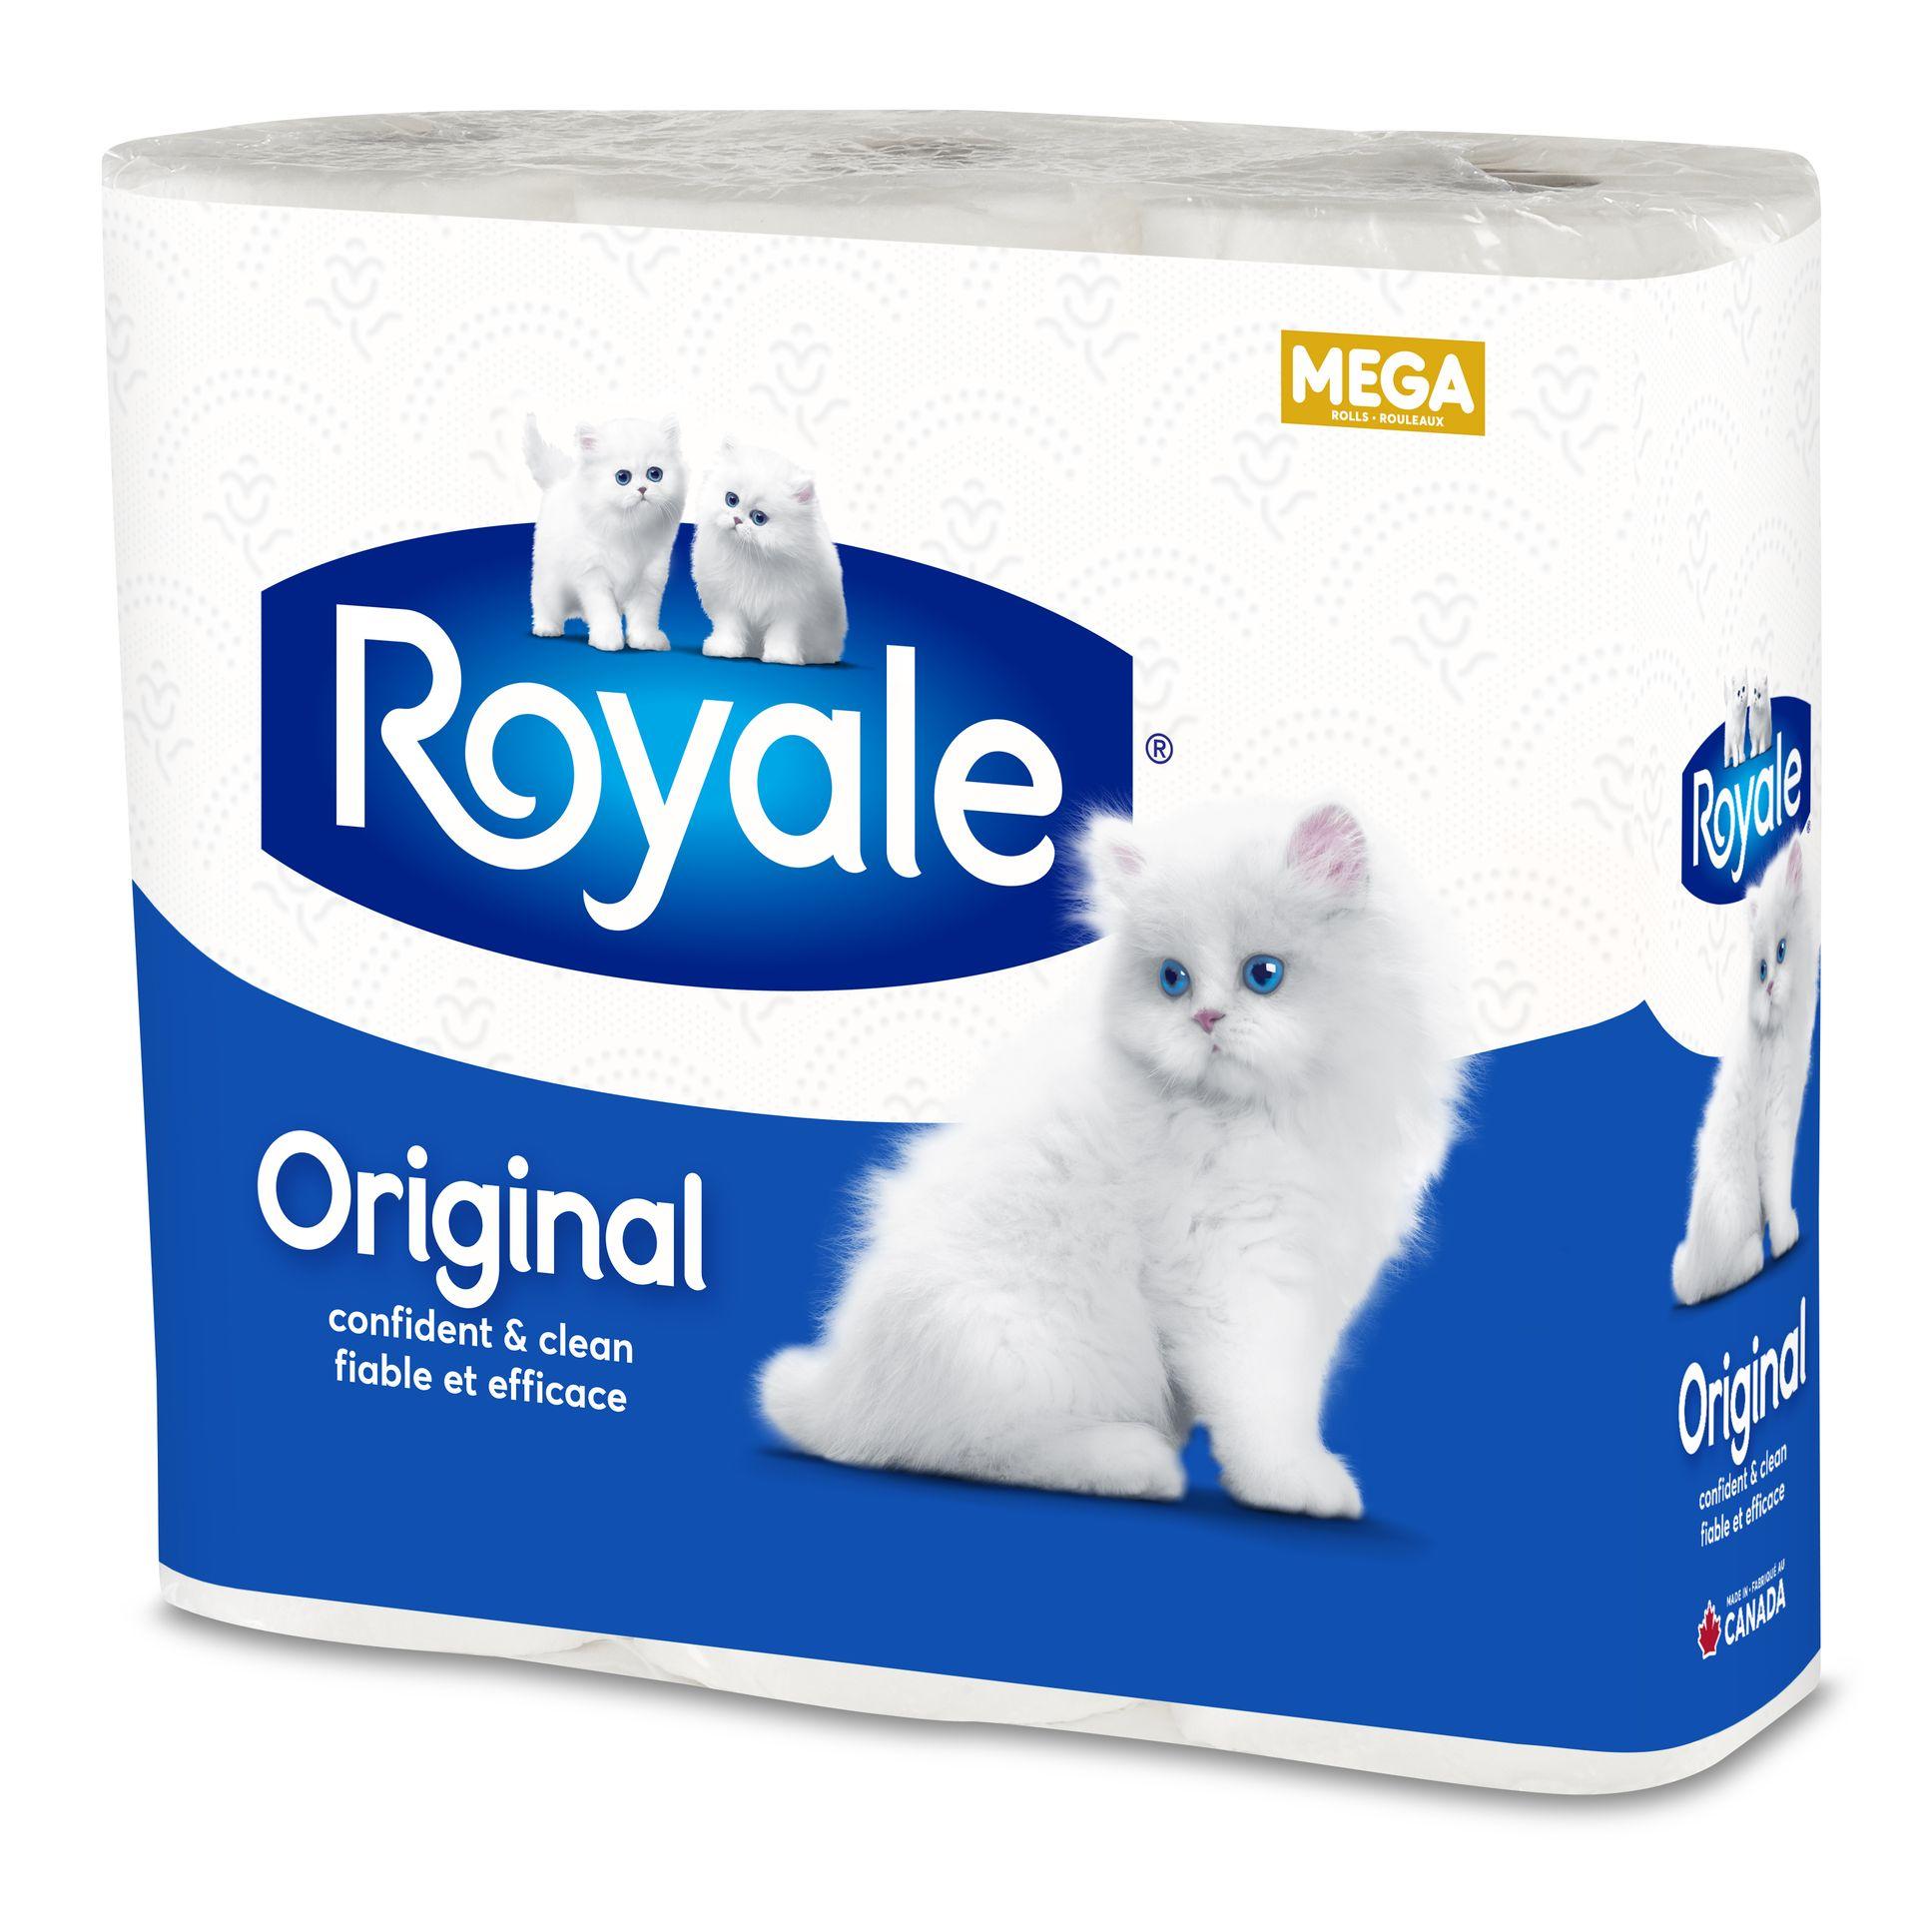 Original, rouleaux Mega pack